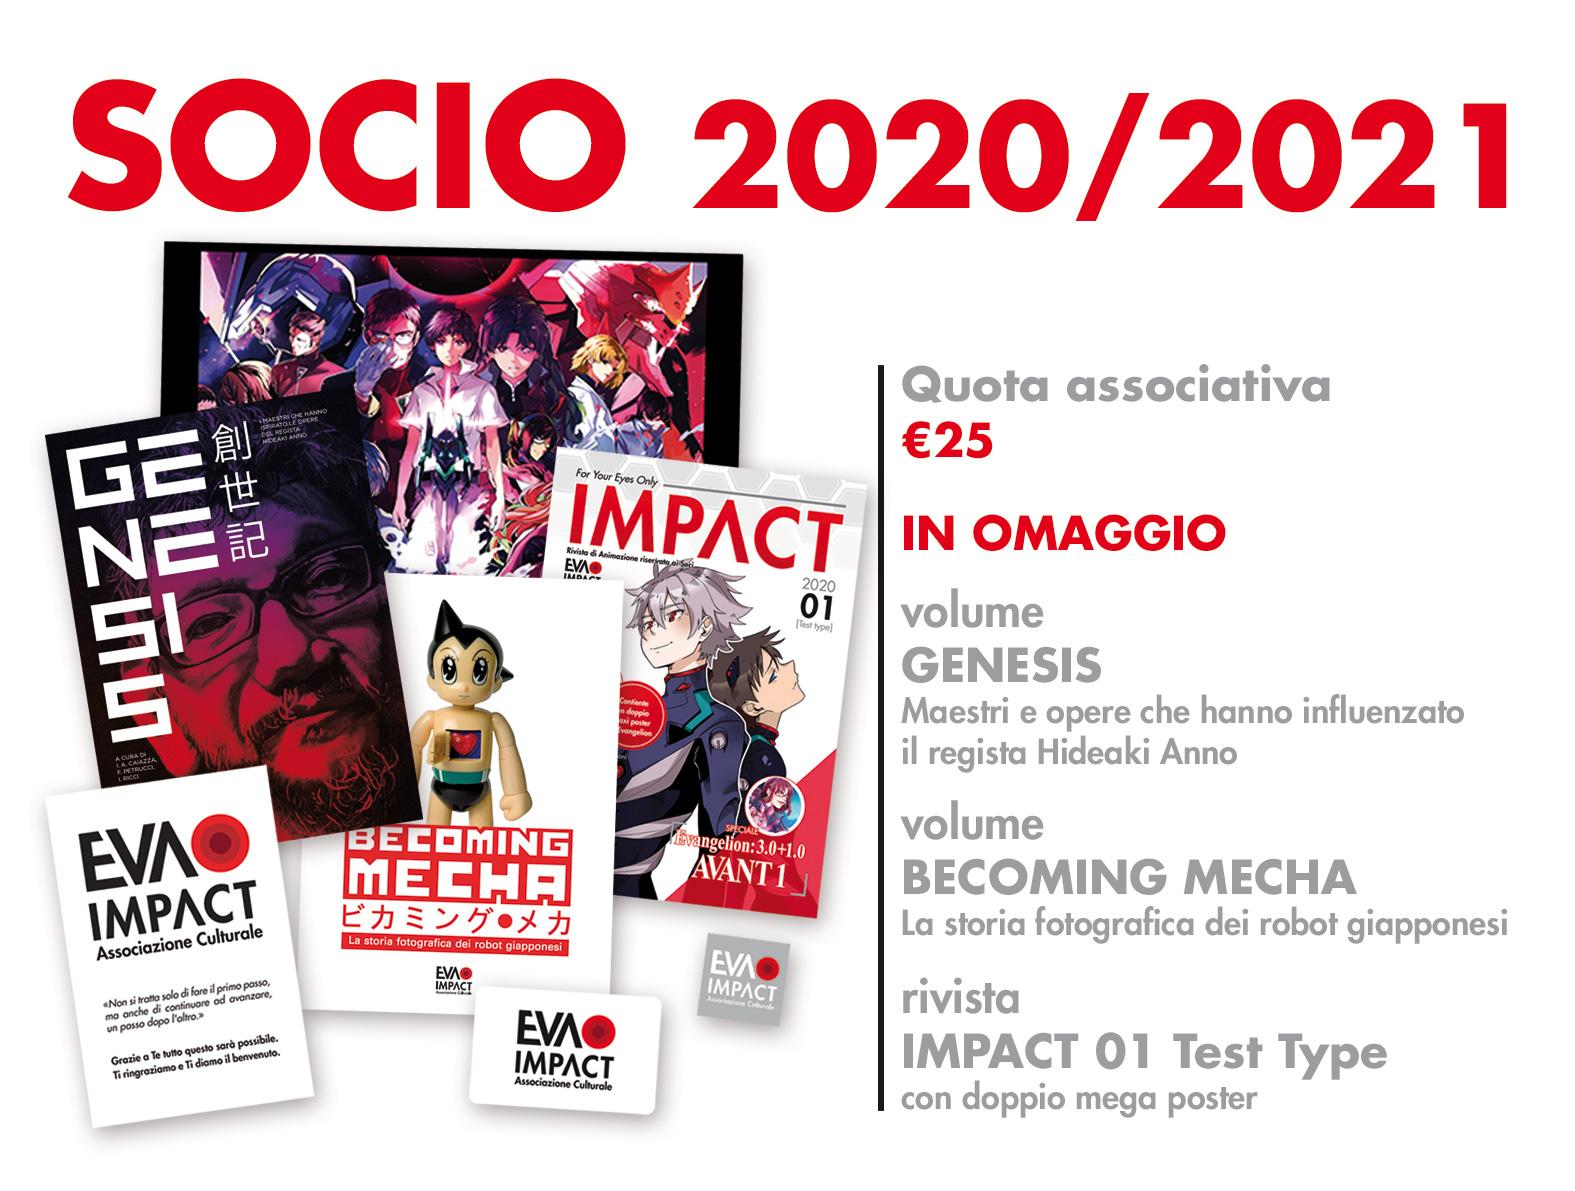 Socio 2020/2021 - Associazione Culturale EVA IMPACT